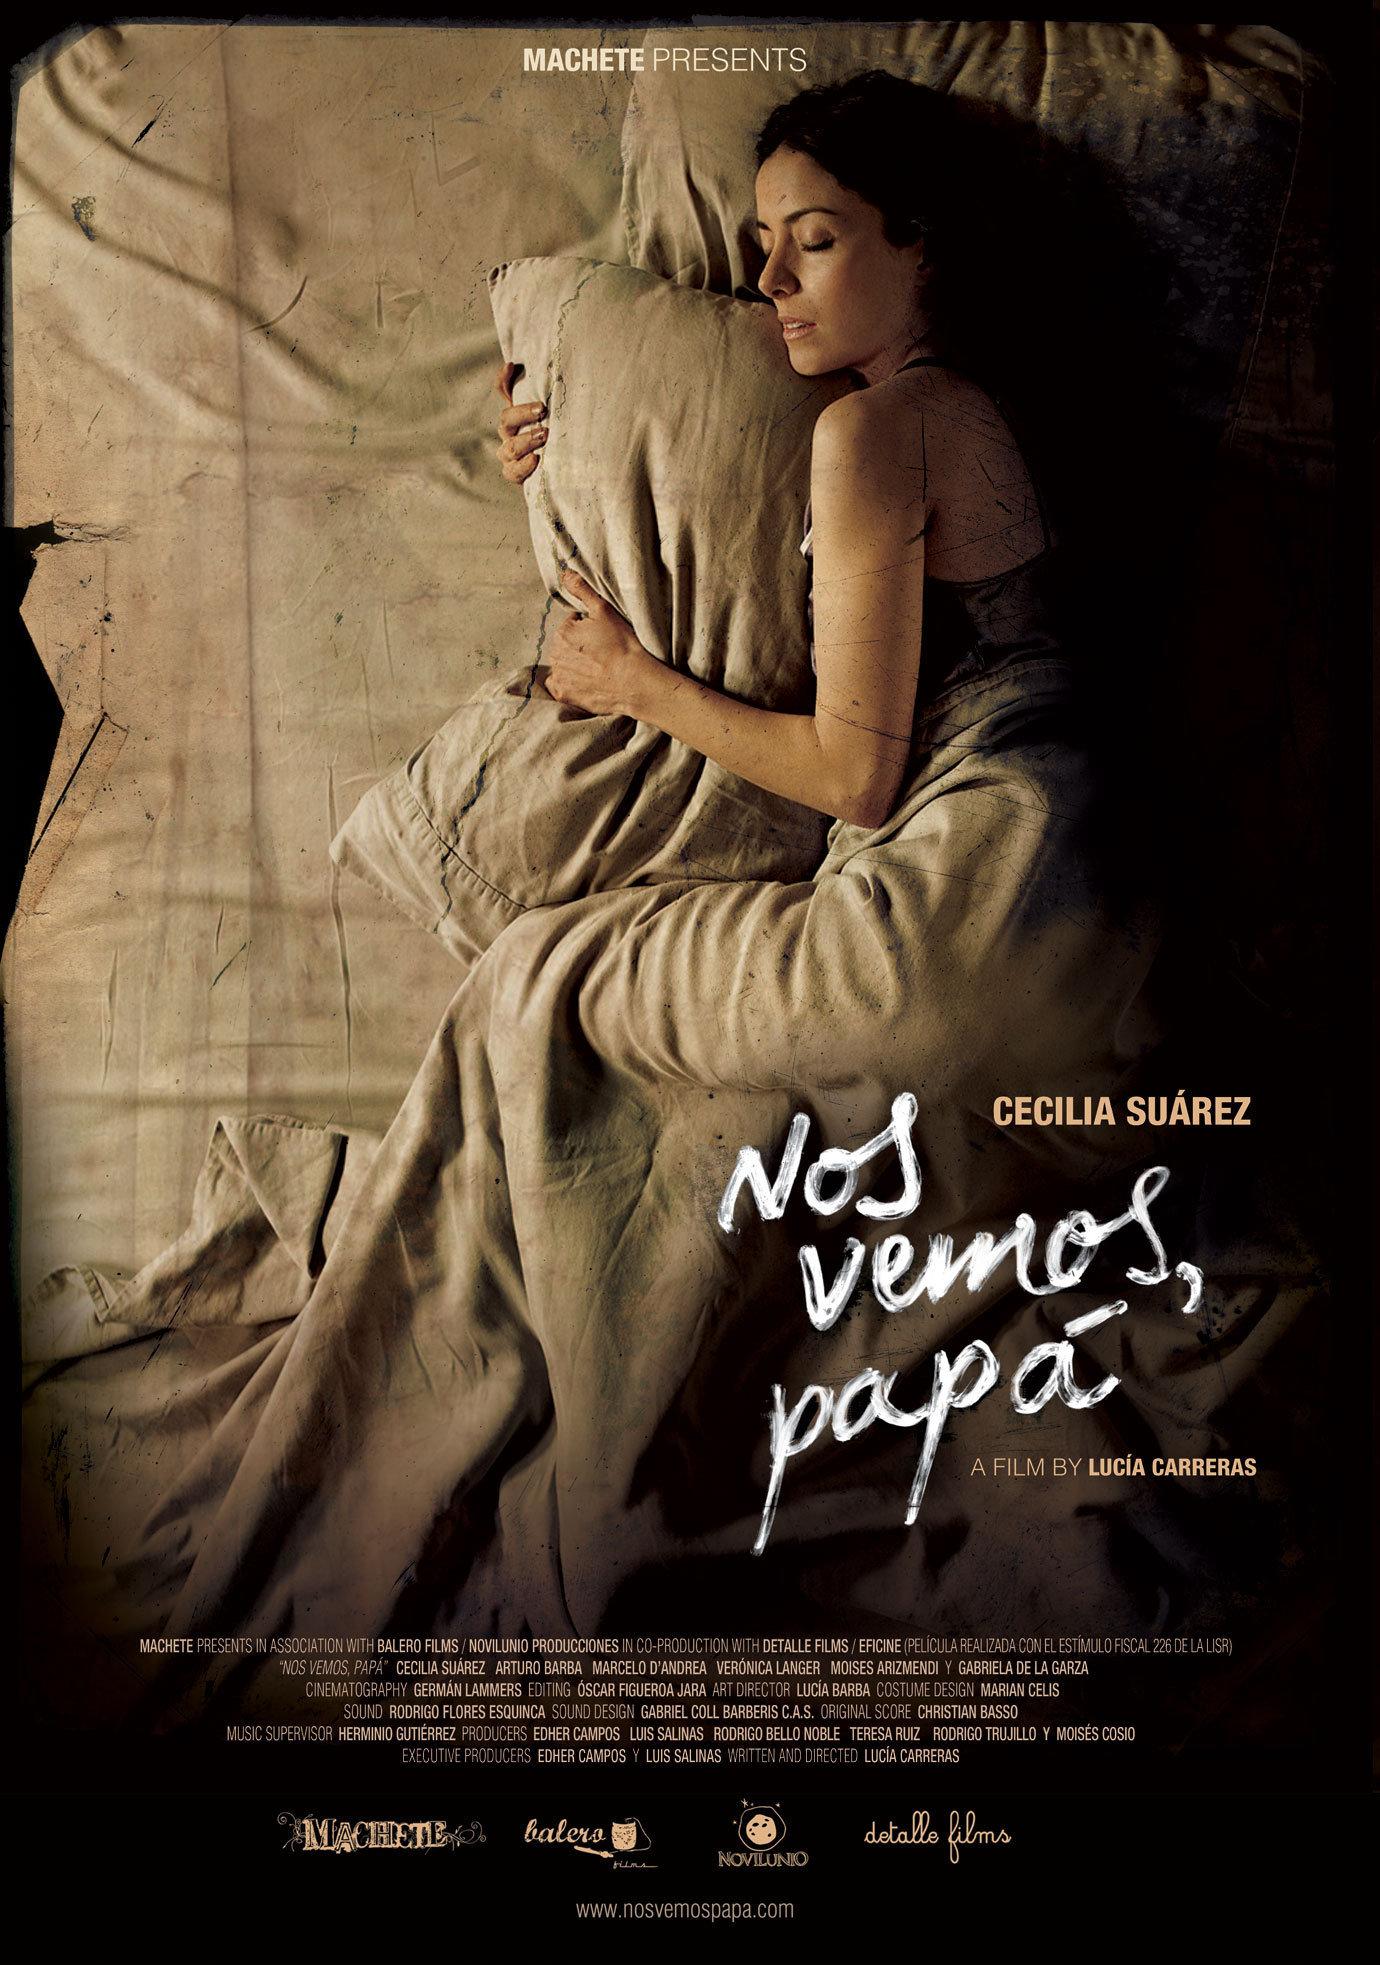 Nos Vemos Papa 2011 Imdb Vámonos = vamos + nos (direct object pronoun in 1st person plural). nos vemos papa 2011 imdb